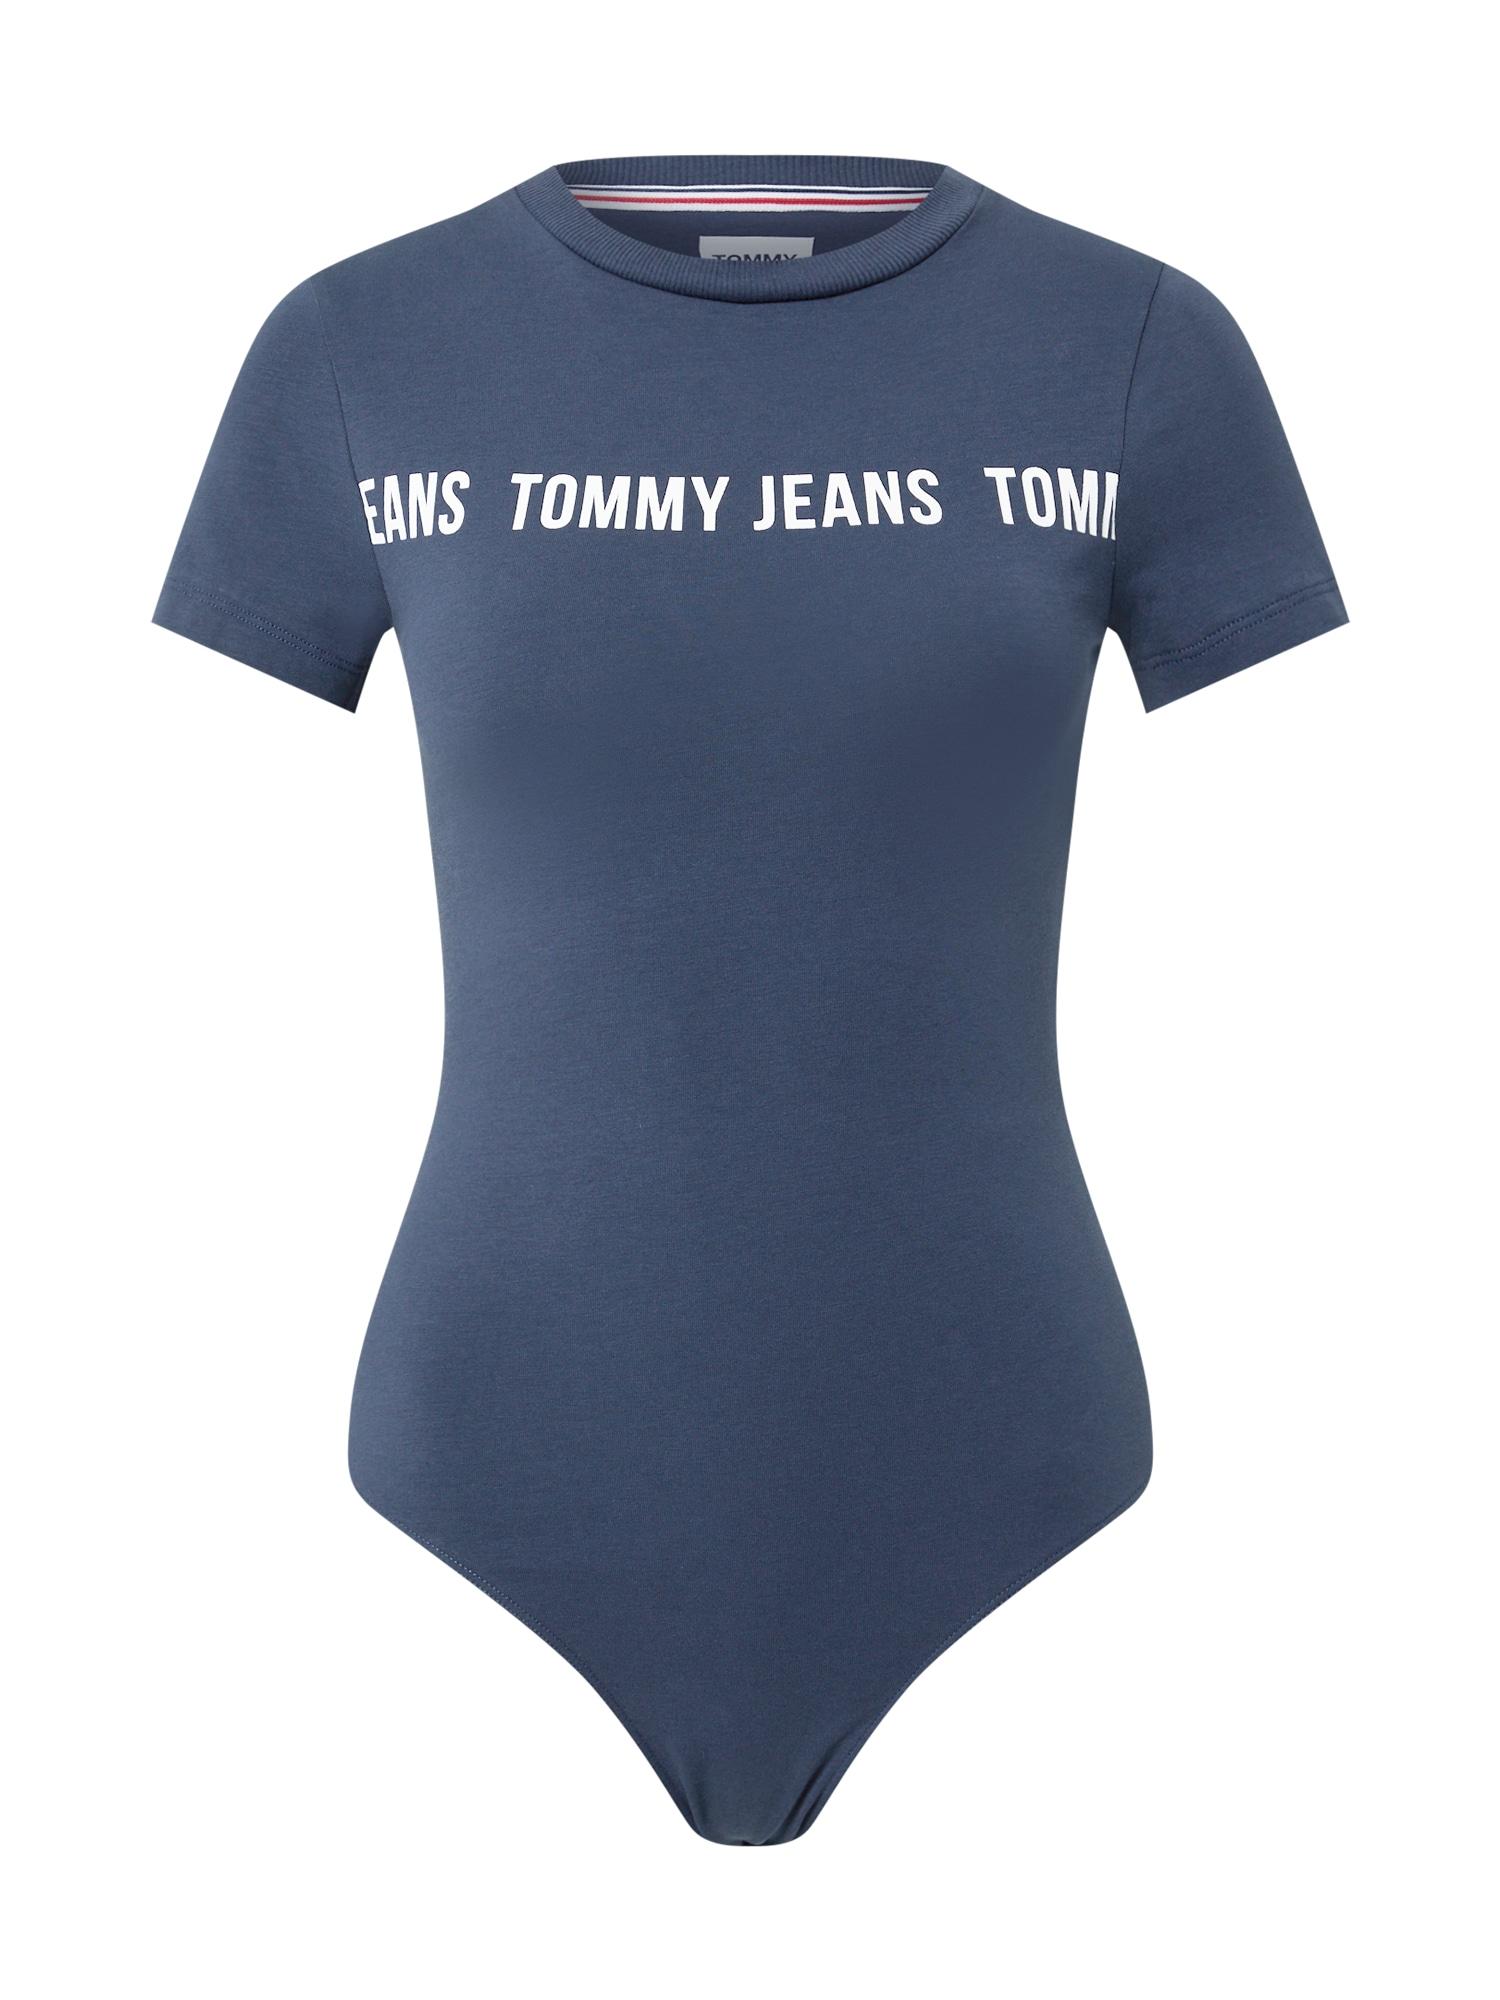 Tommy Jeans Marškinėliai-glaustinukė melsvai pilka / balta